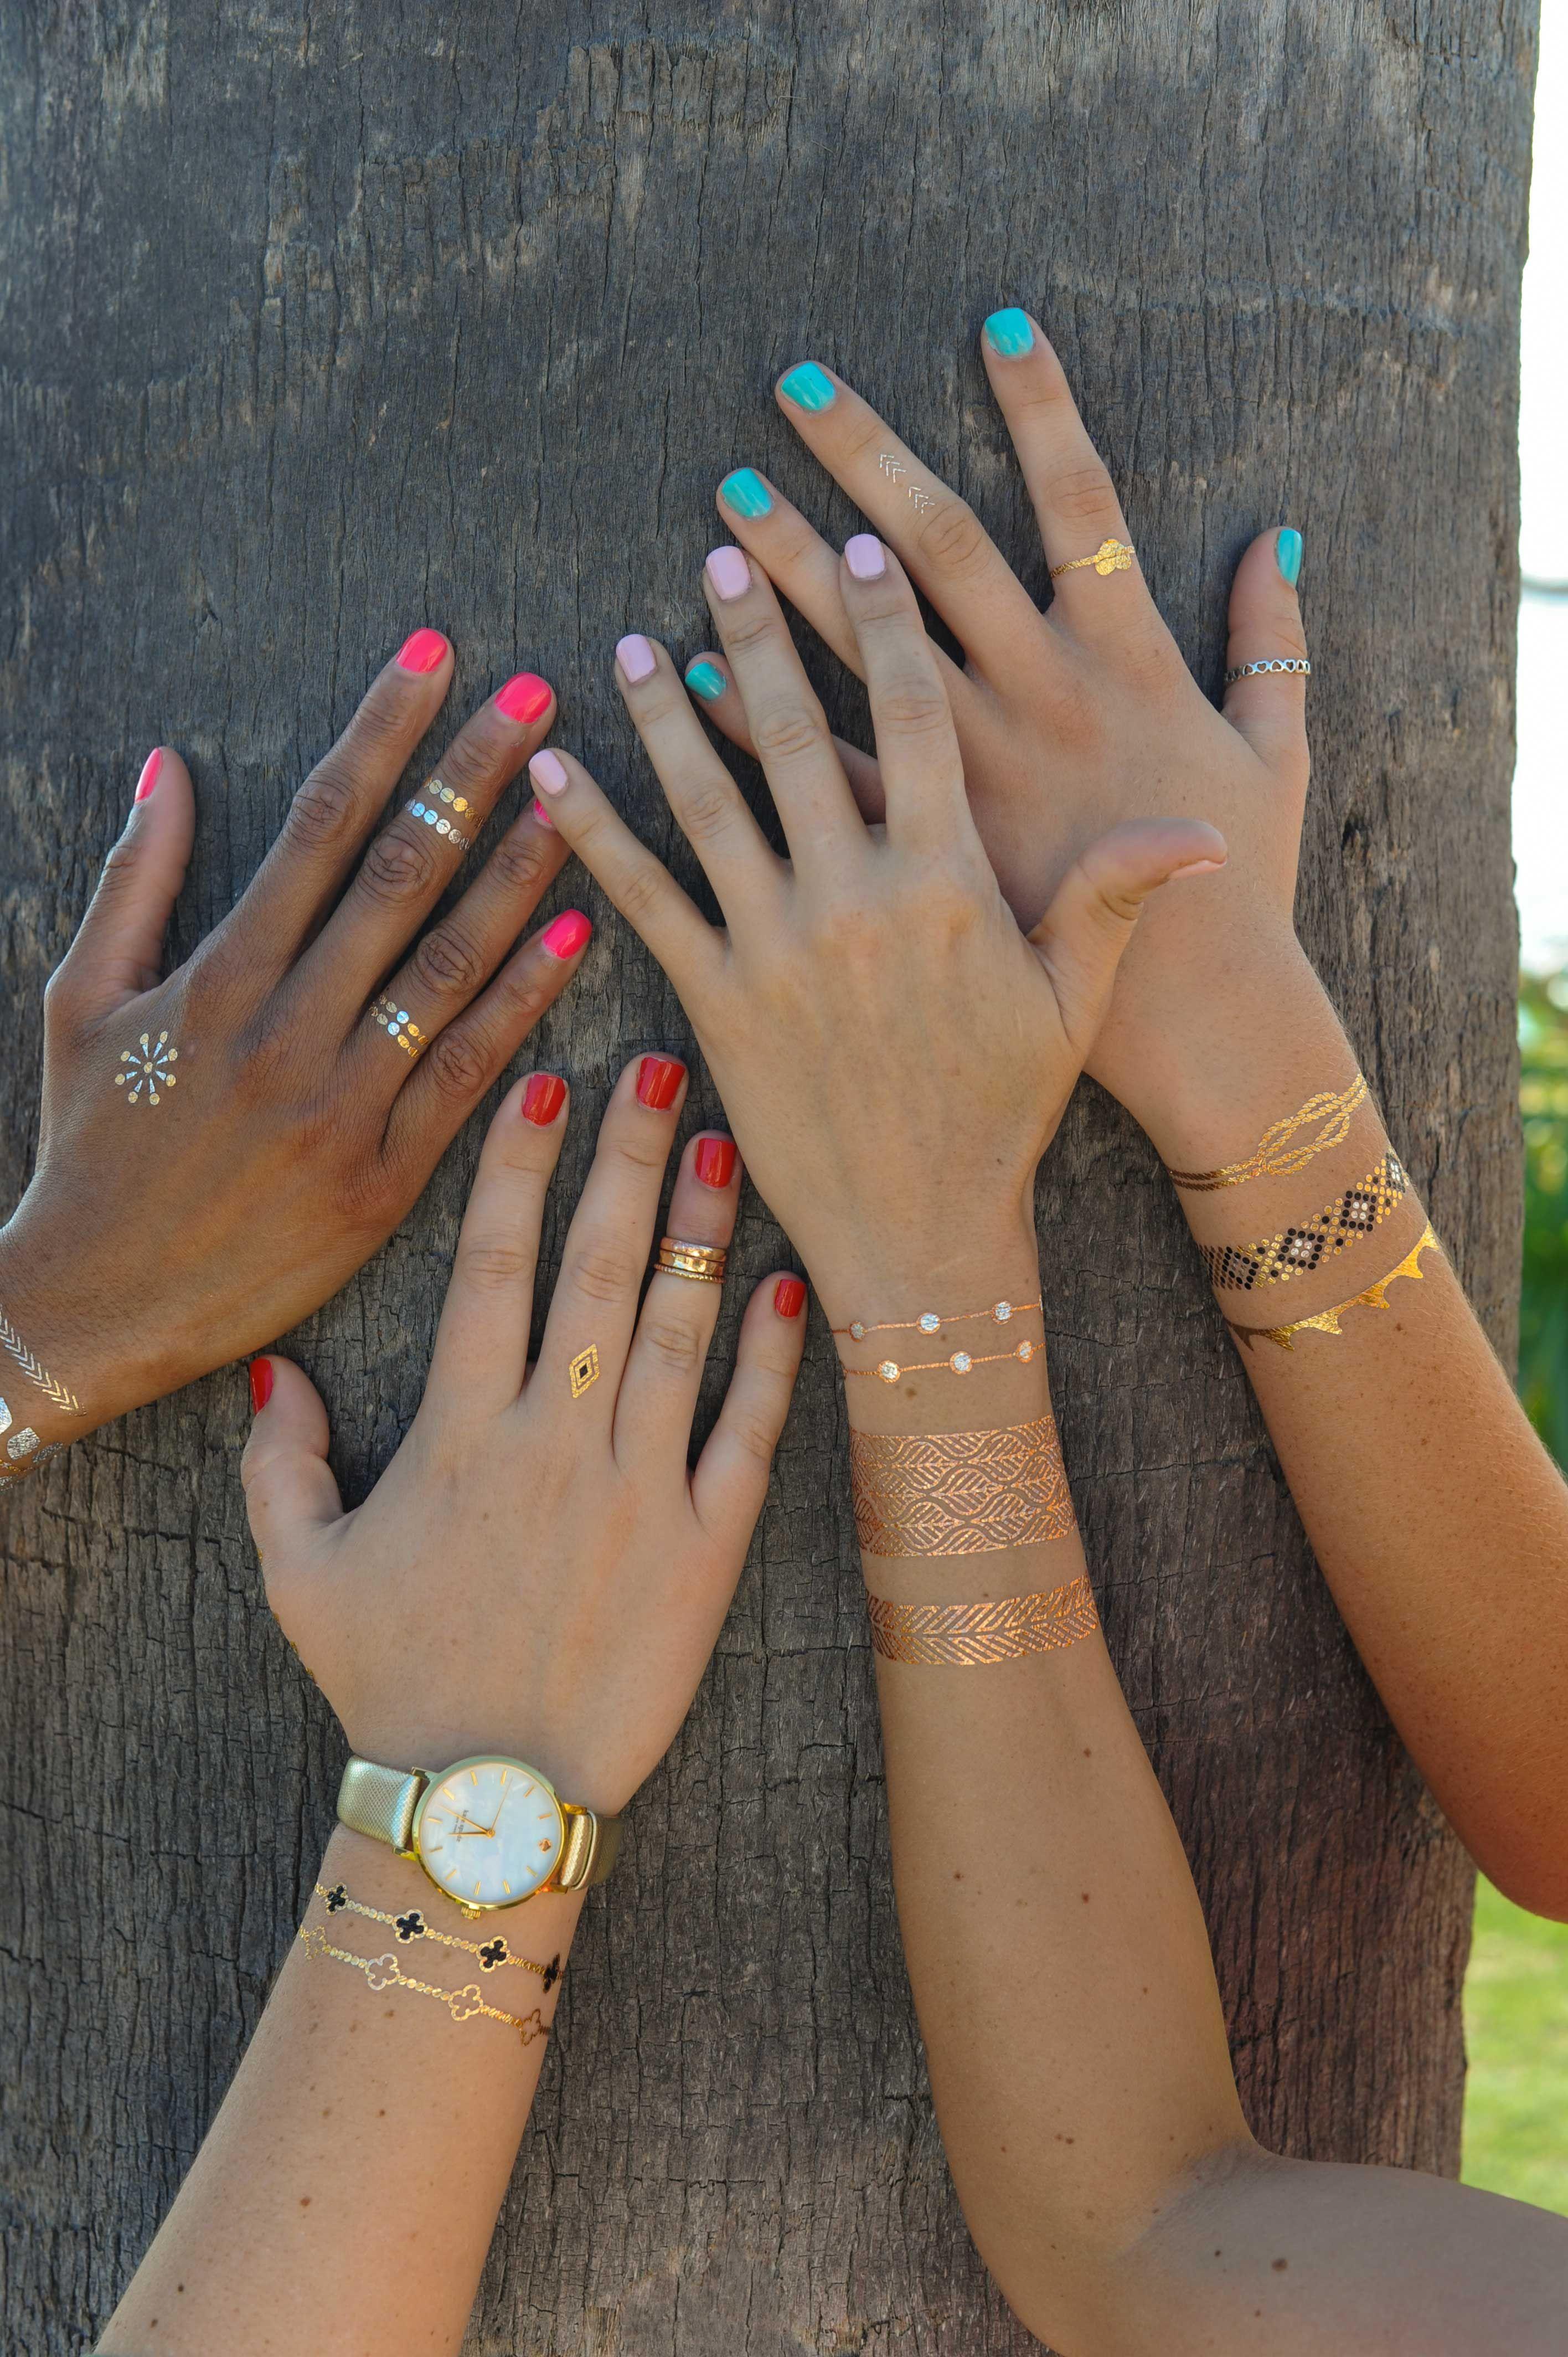 Friendship palm trees tribetats tattoo pinterest summer